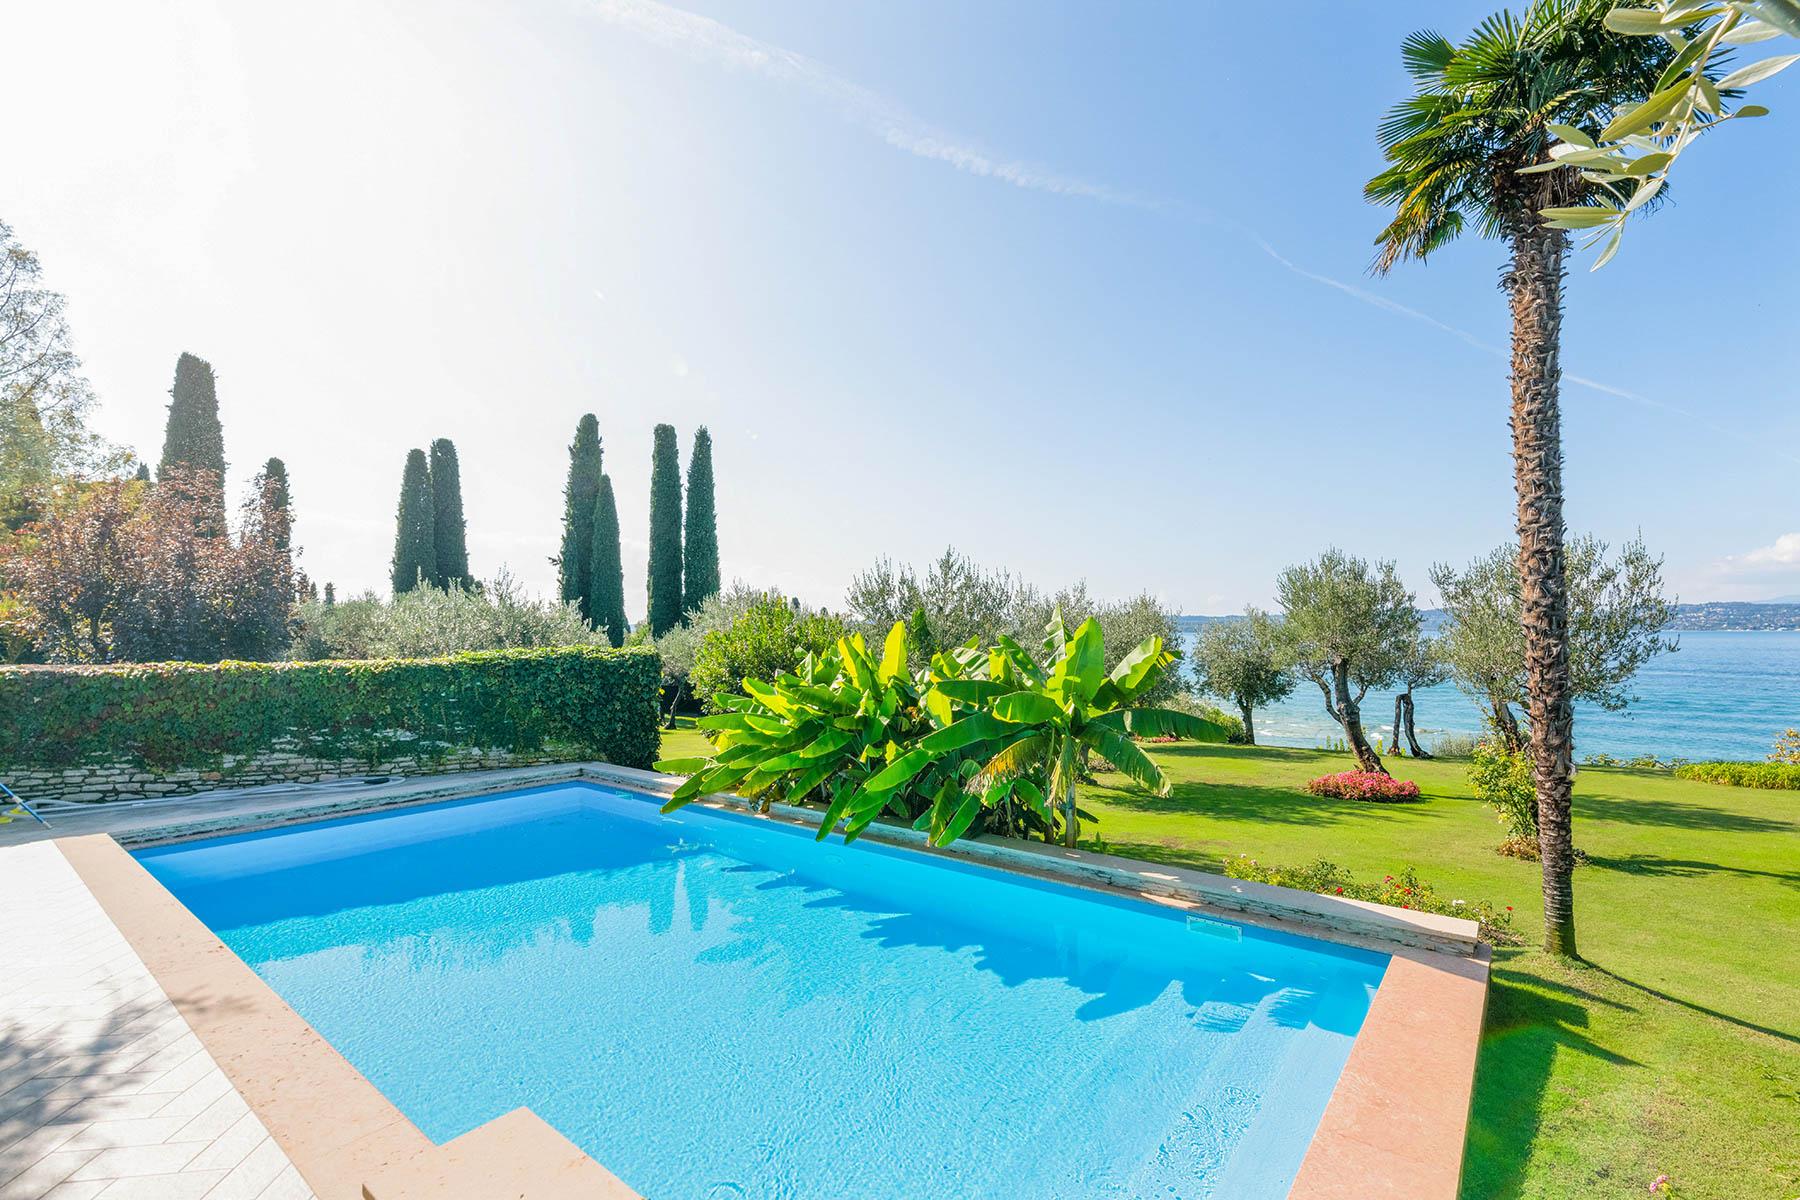 Villa in Vendita a Sirmione: 5 locali, 500 mq - Foto 6